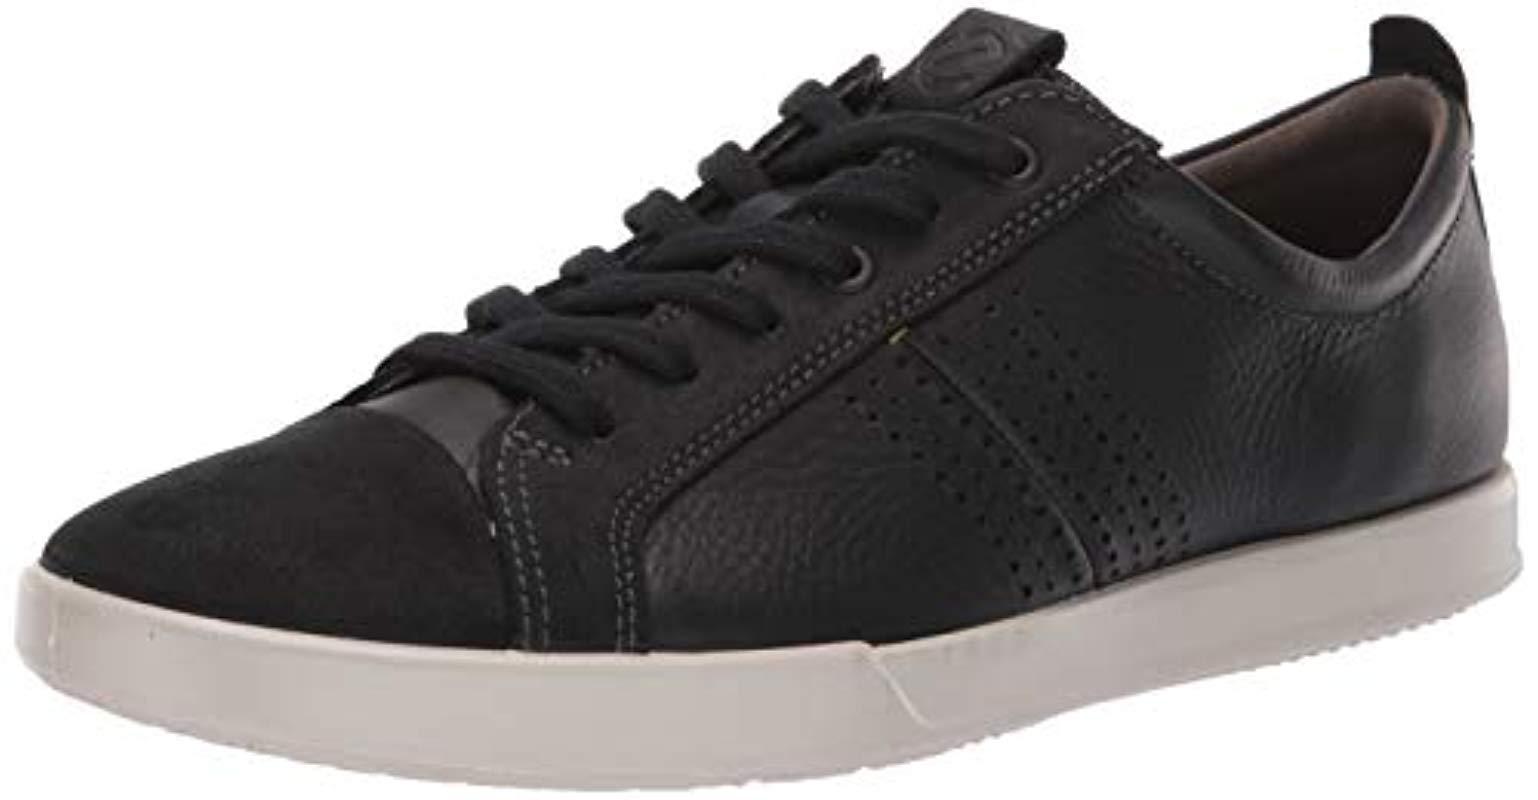 944f2b31d8ea Lyst - Ecco Collin 2.0 Trend Sneaker in Black for Men - Save 23%